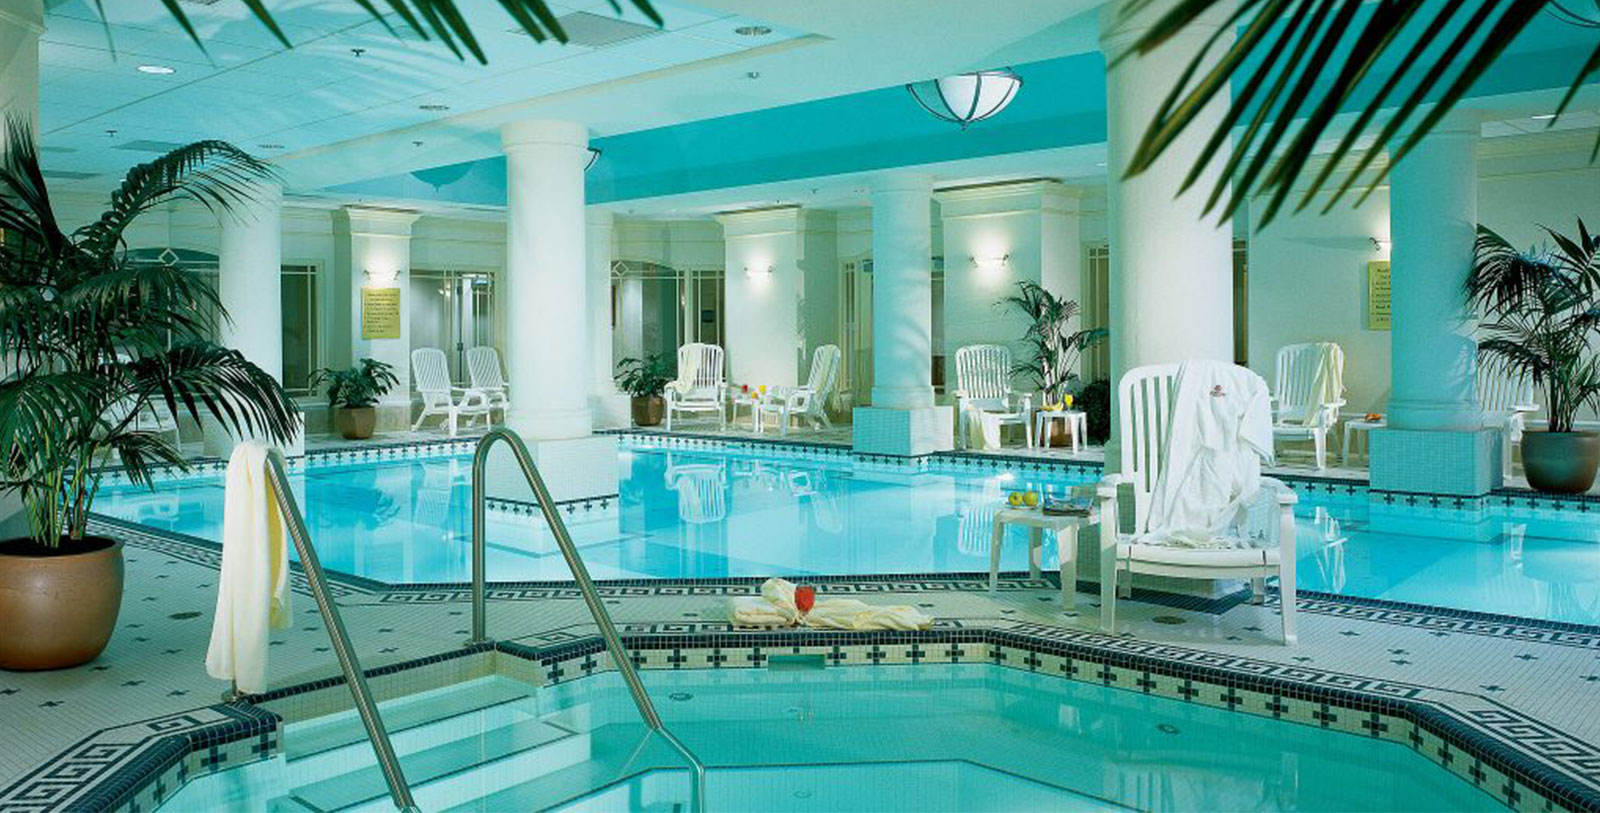 Image of Pool, Fairmont Palliser, 1914, Member of Historic Hotels Worldwide, in Calgary, Alberta, Spa